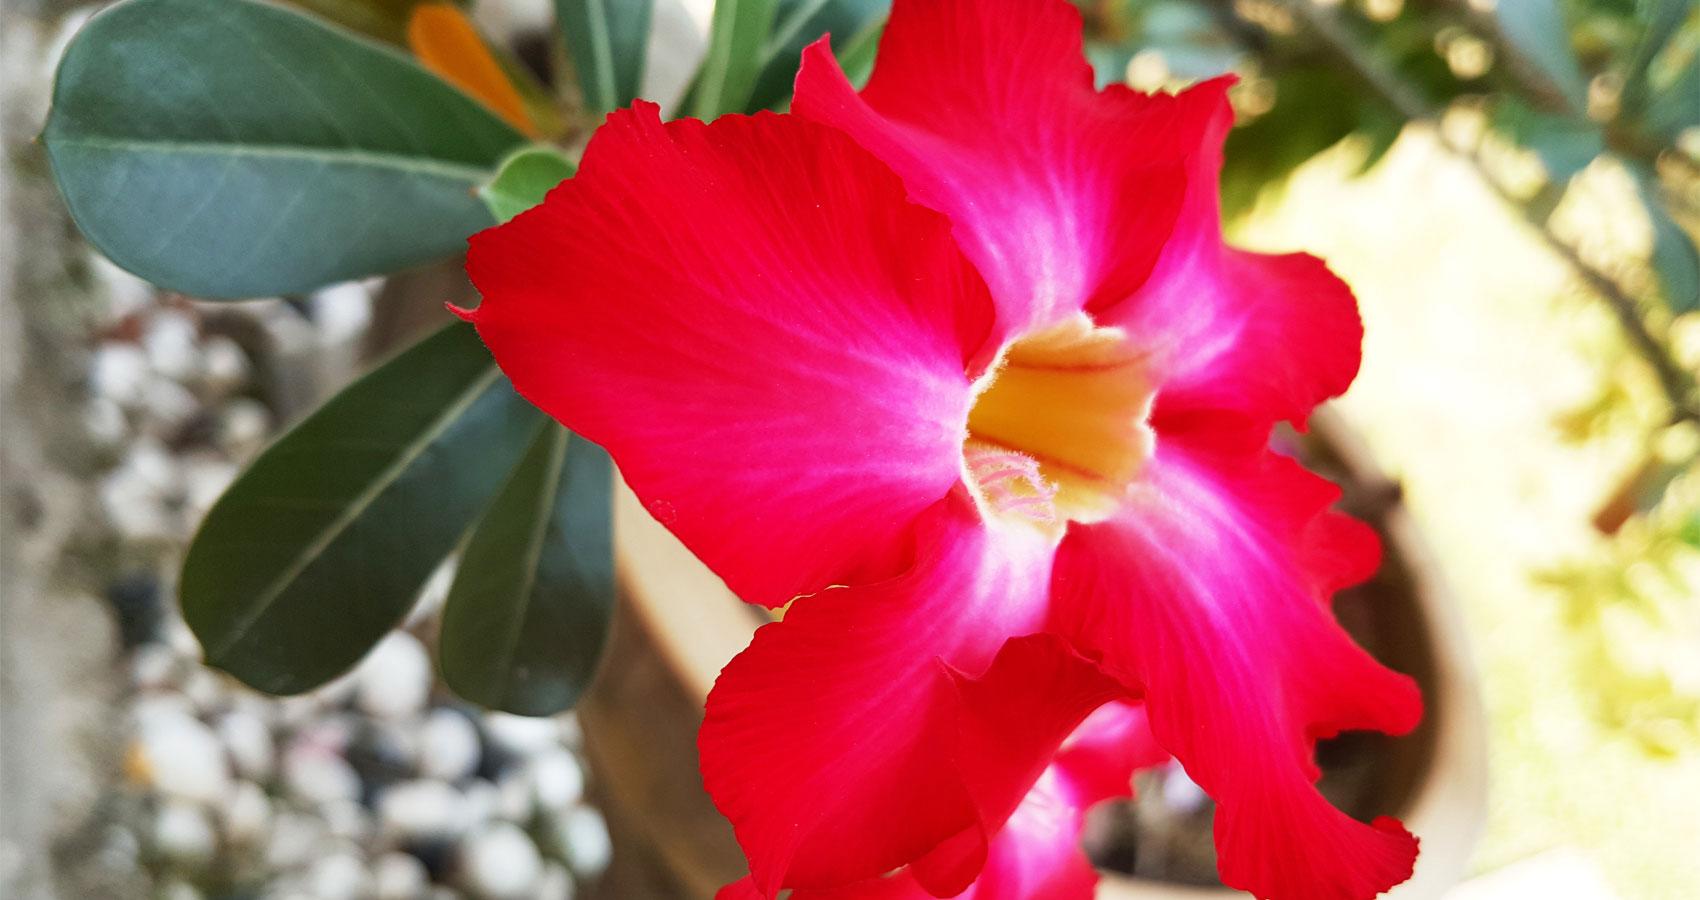 Prosperity Flower Haiku by Jfaydreams at Spillwords.com